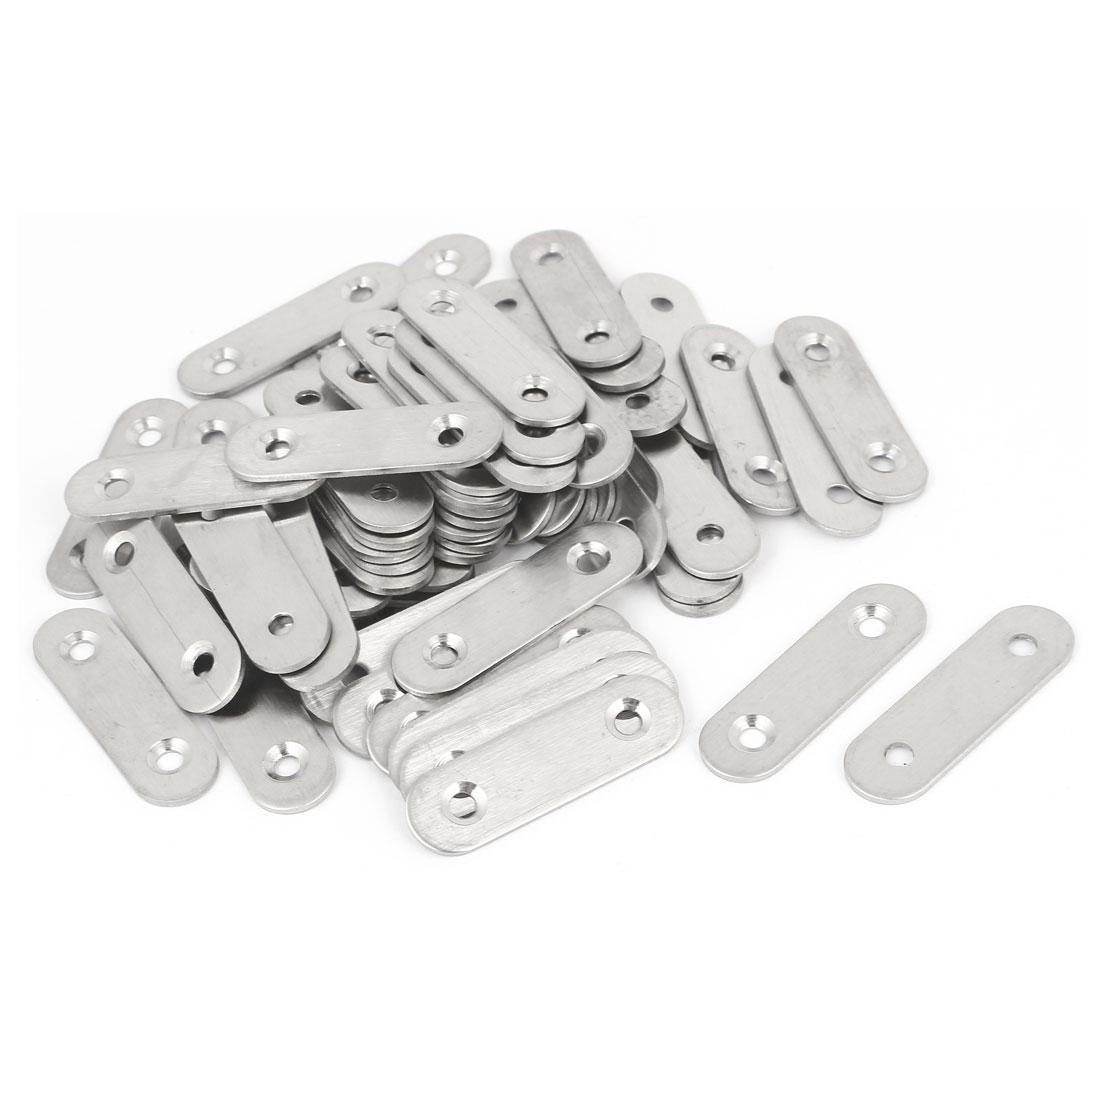 50mm x 15mm x 2mm Stainless Steel Straight Bracket Flat Repair Plate 60PCS